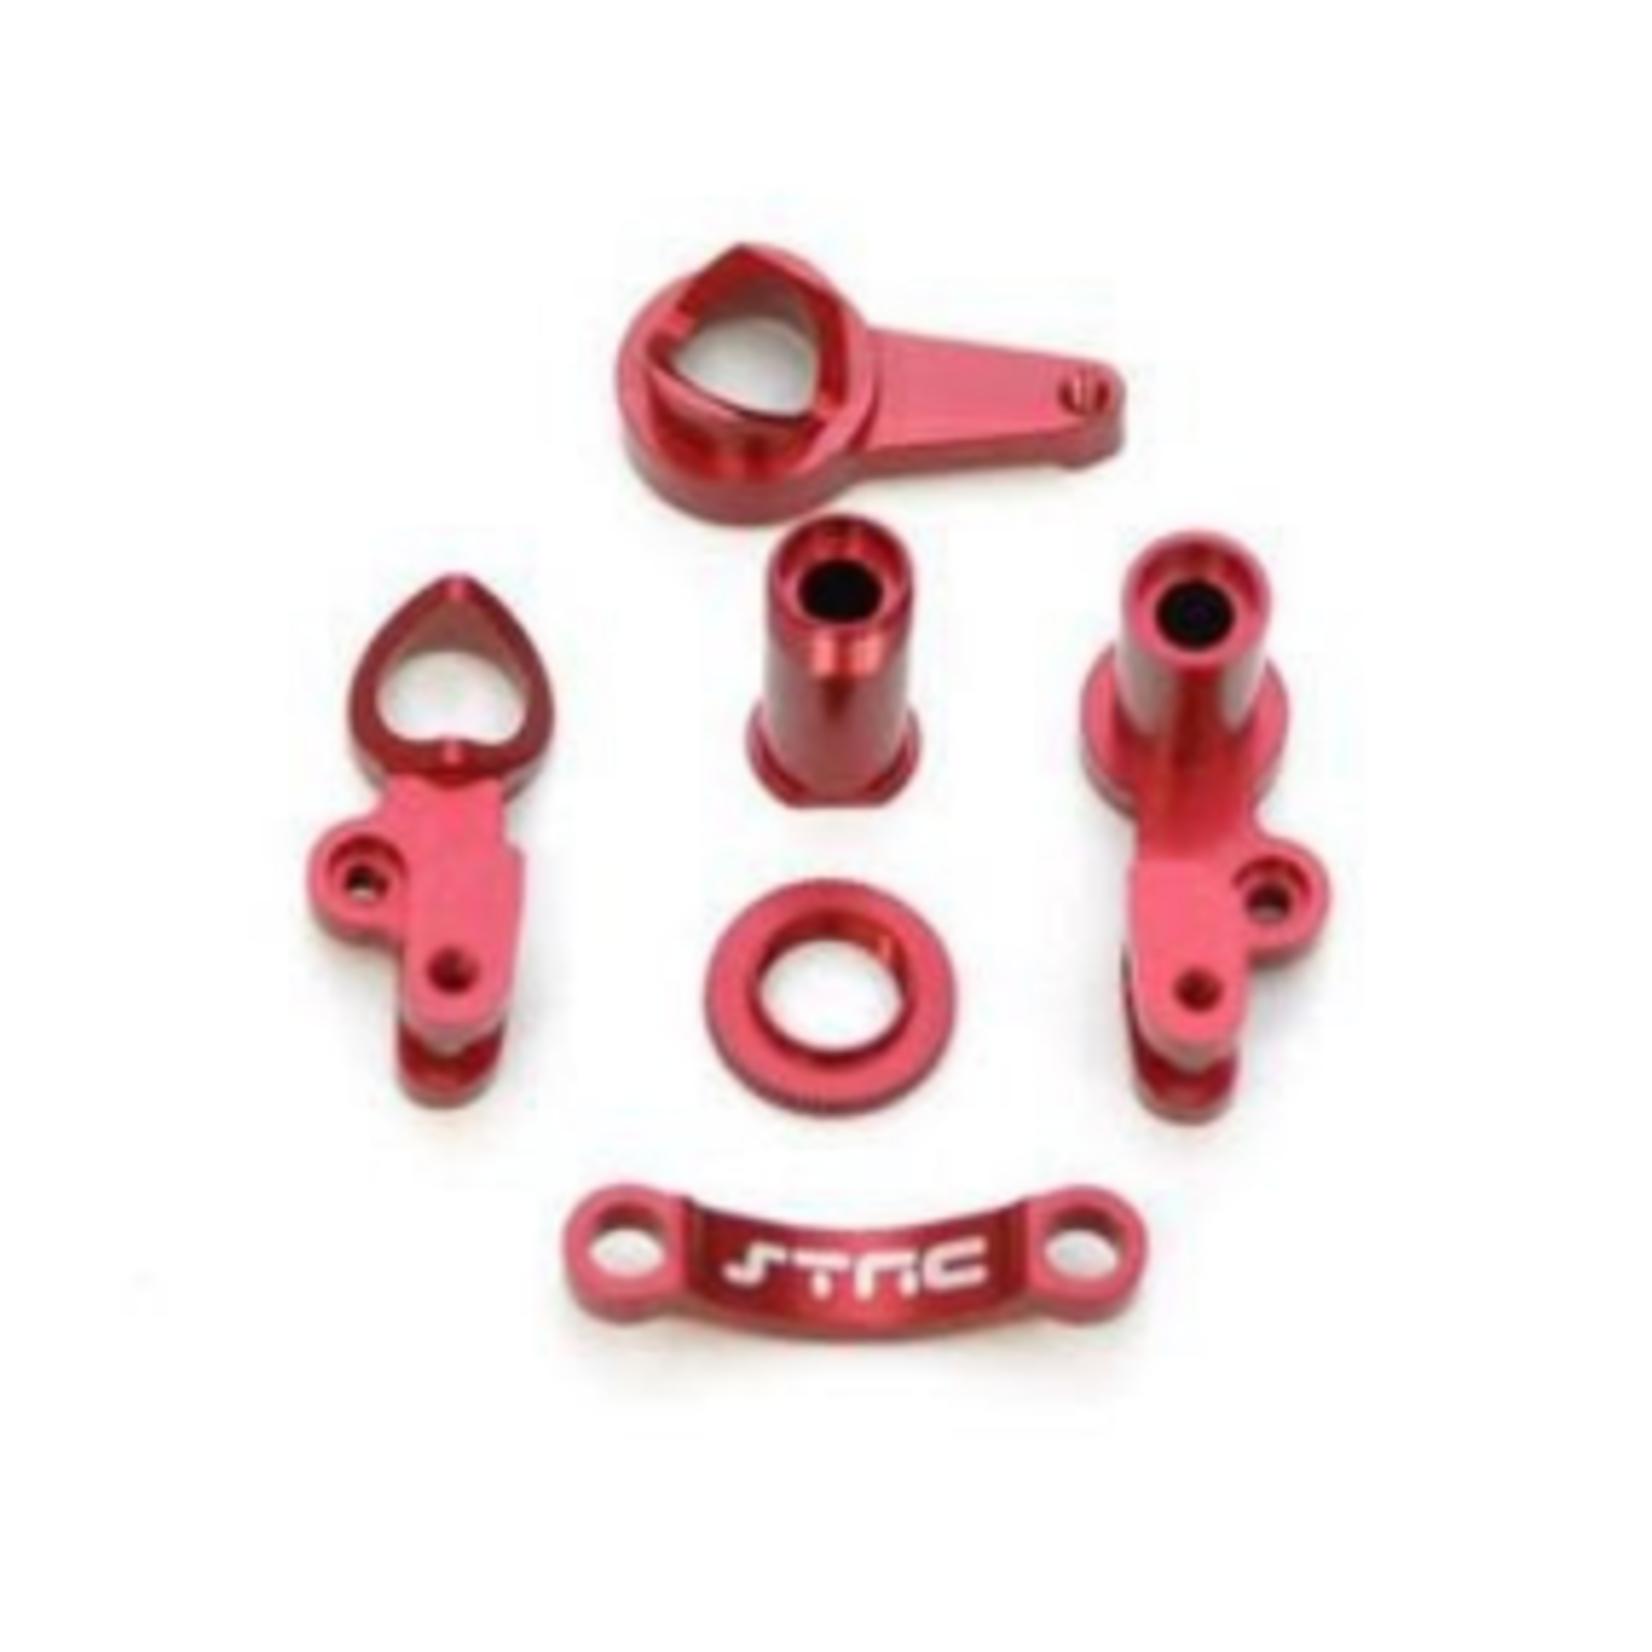 ST Racing Concepts SPTST6845R ST Racing Concepts CNC Machined Aluminum Multi-Piece STeering Bellcrank set (Red)